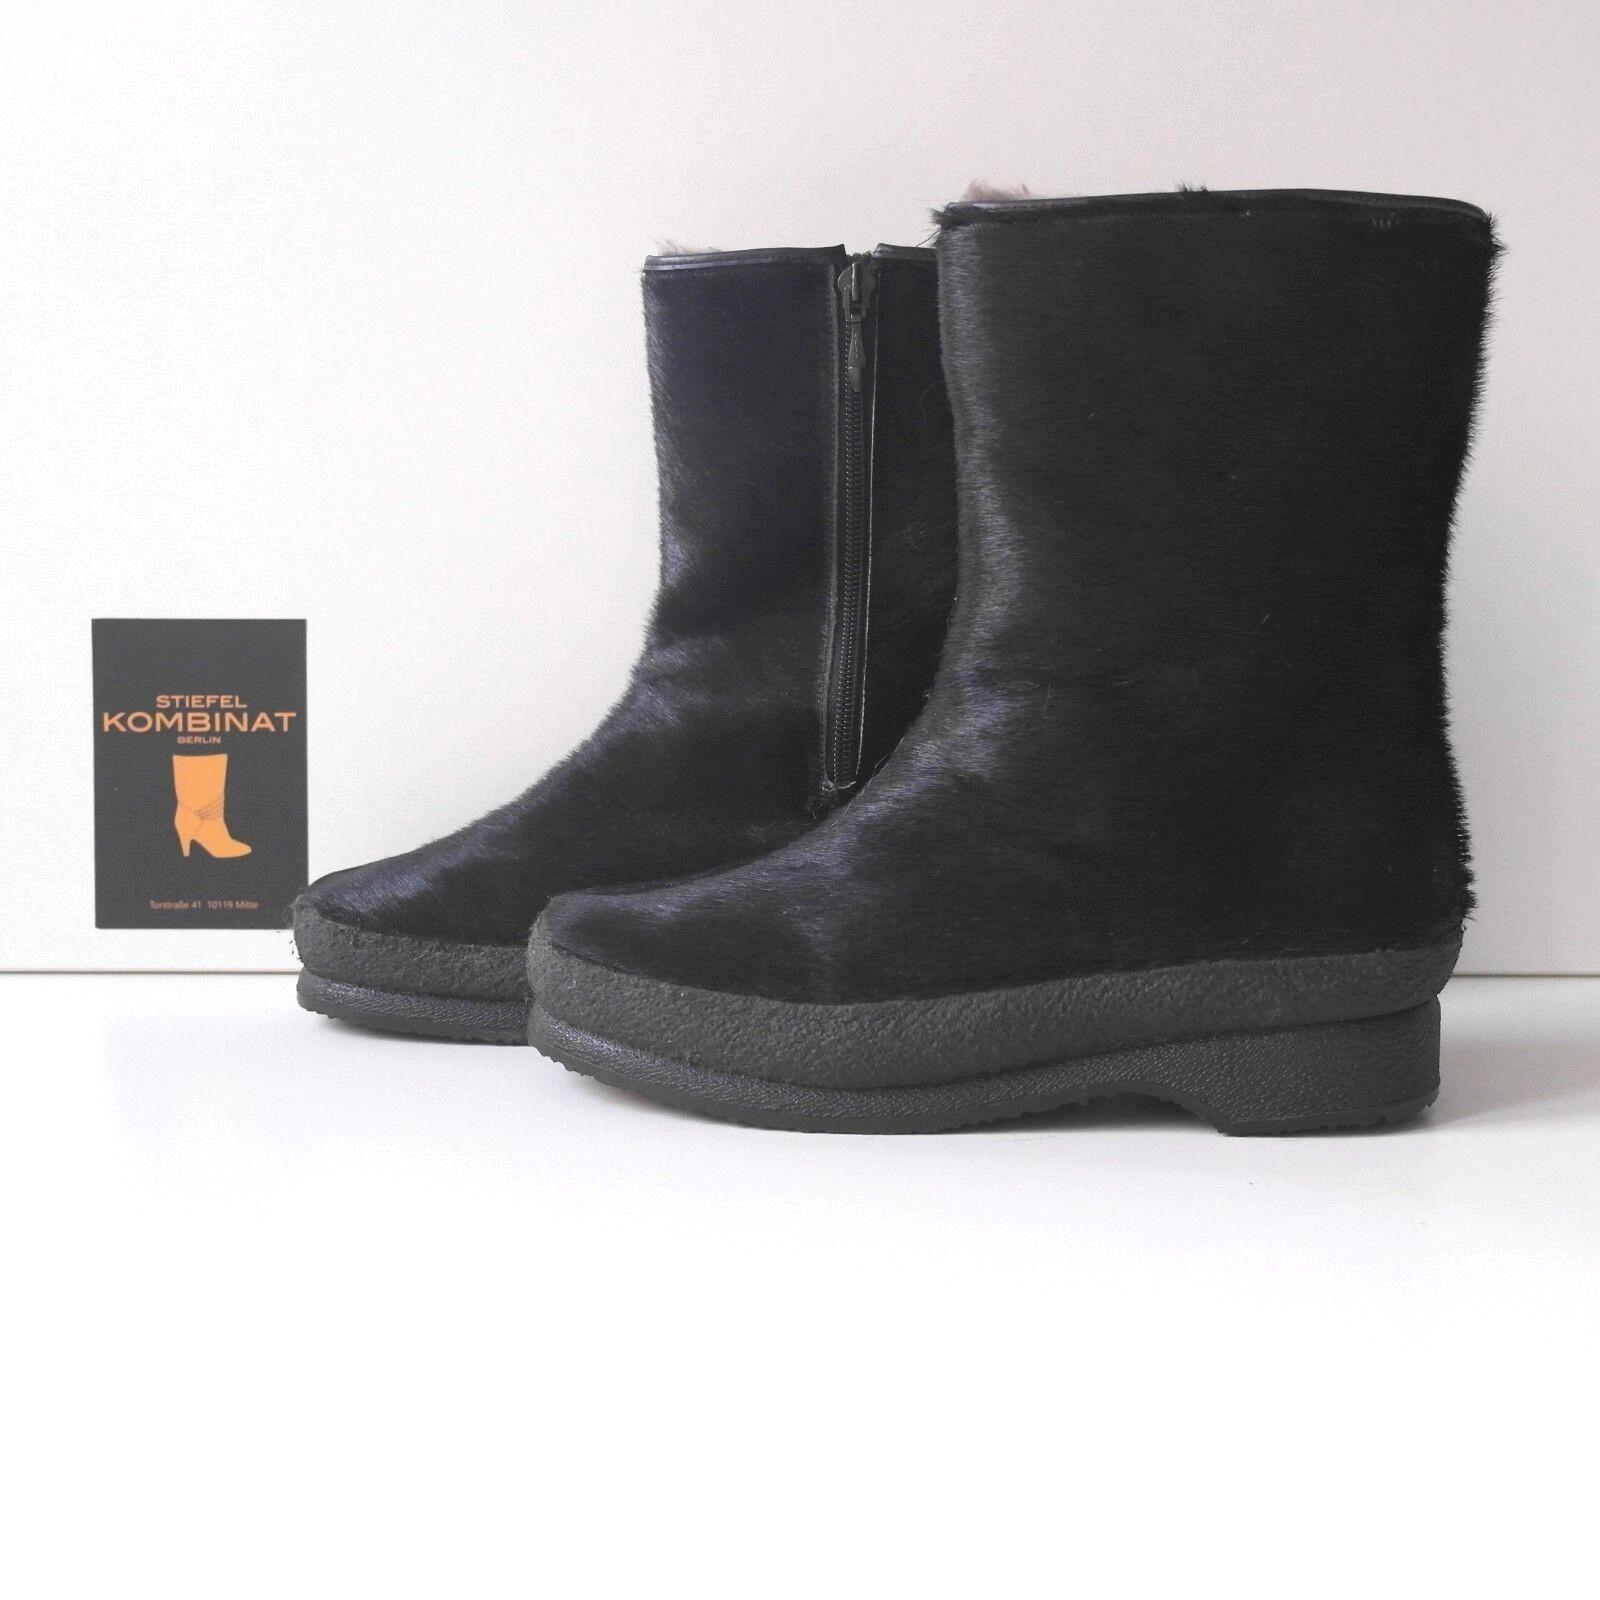 Stivali Pelliccia Stivali Stivali 70er True Vintage Pelliccia Stivali Pelliccia invernali Yeti Boots 213d68